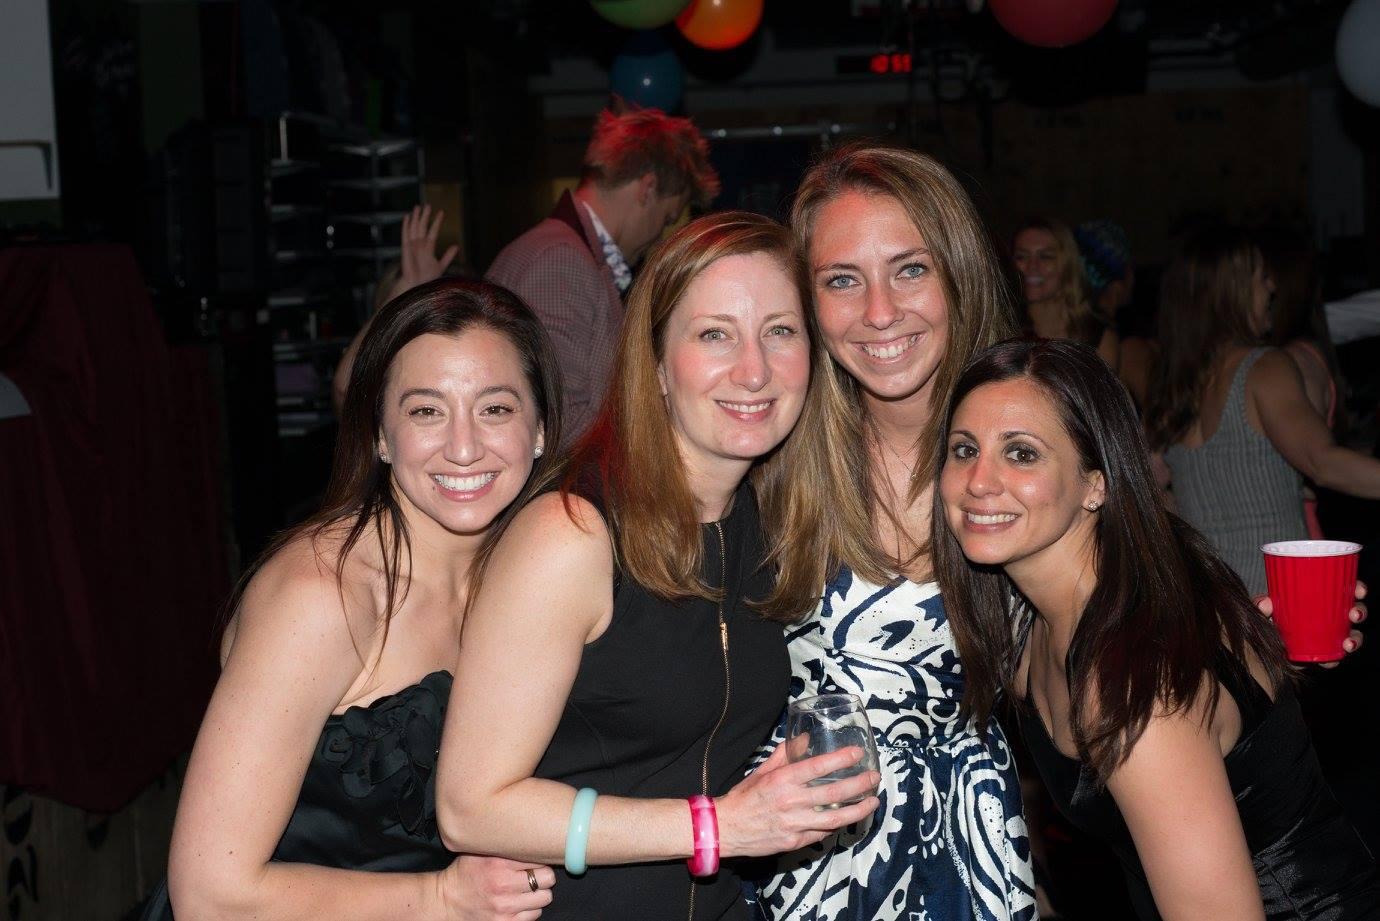 CrossFit Prom 2016: Alicia, Angela, Alexis, Talia